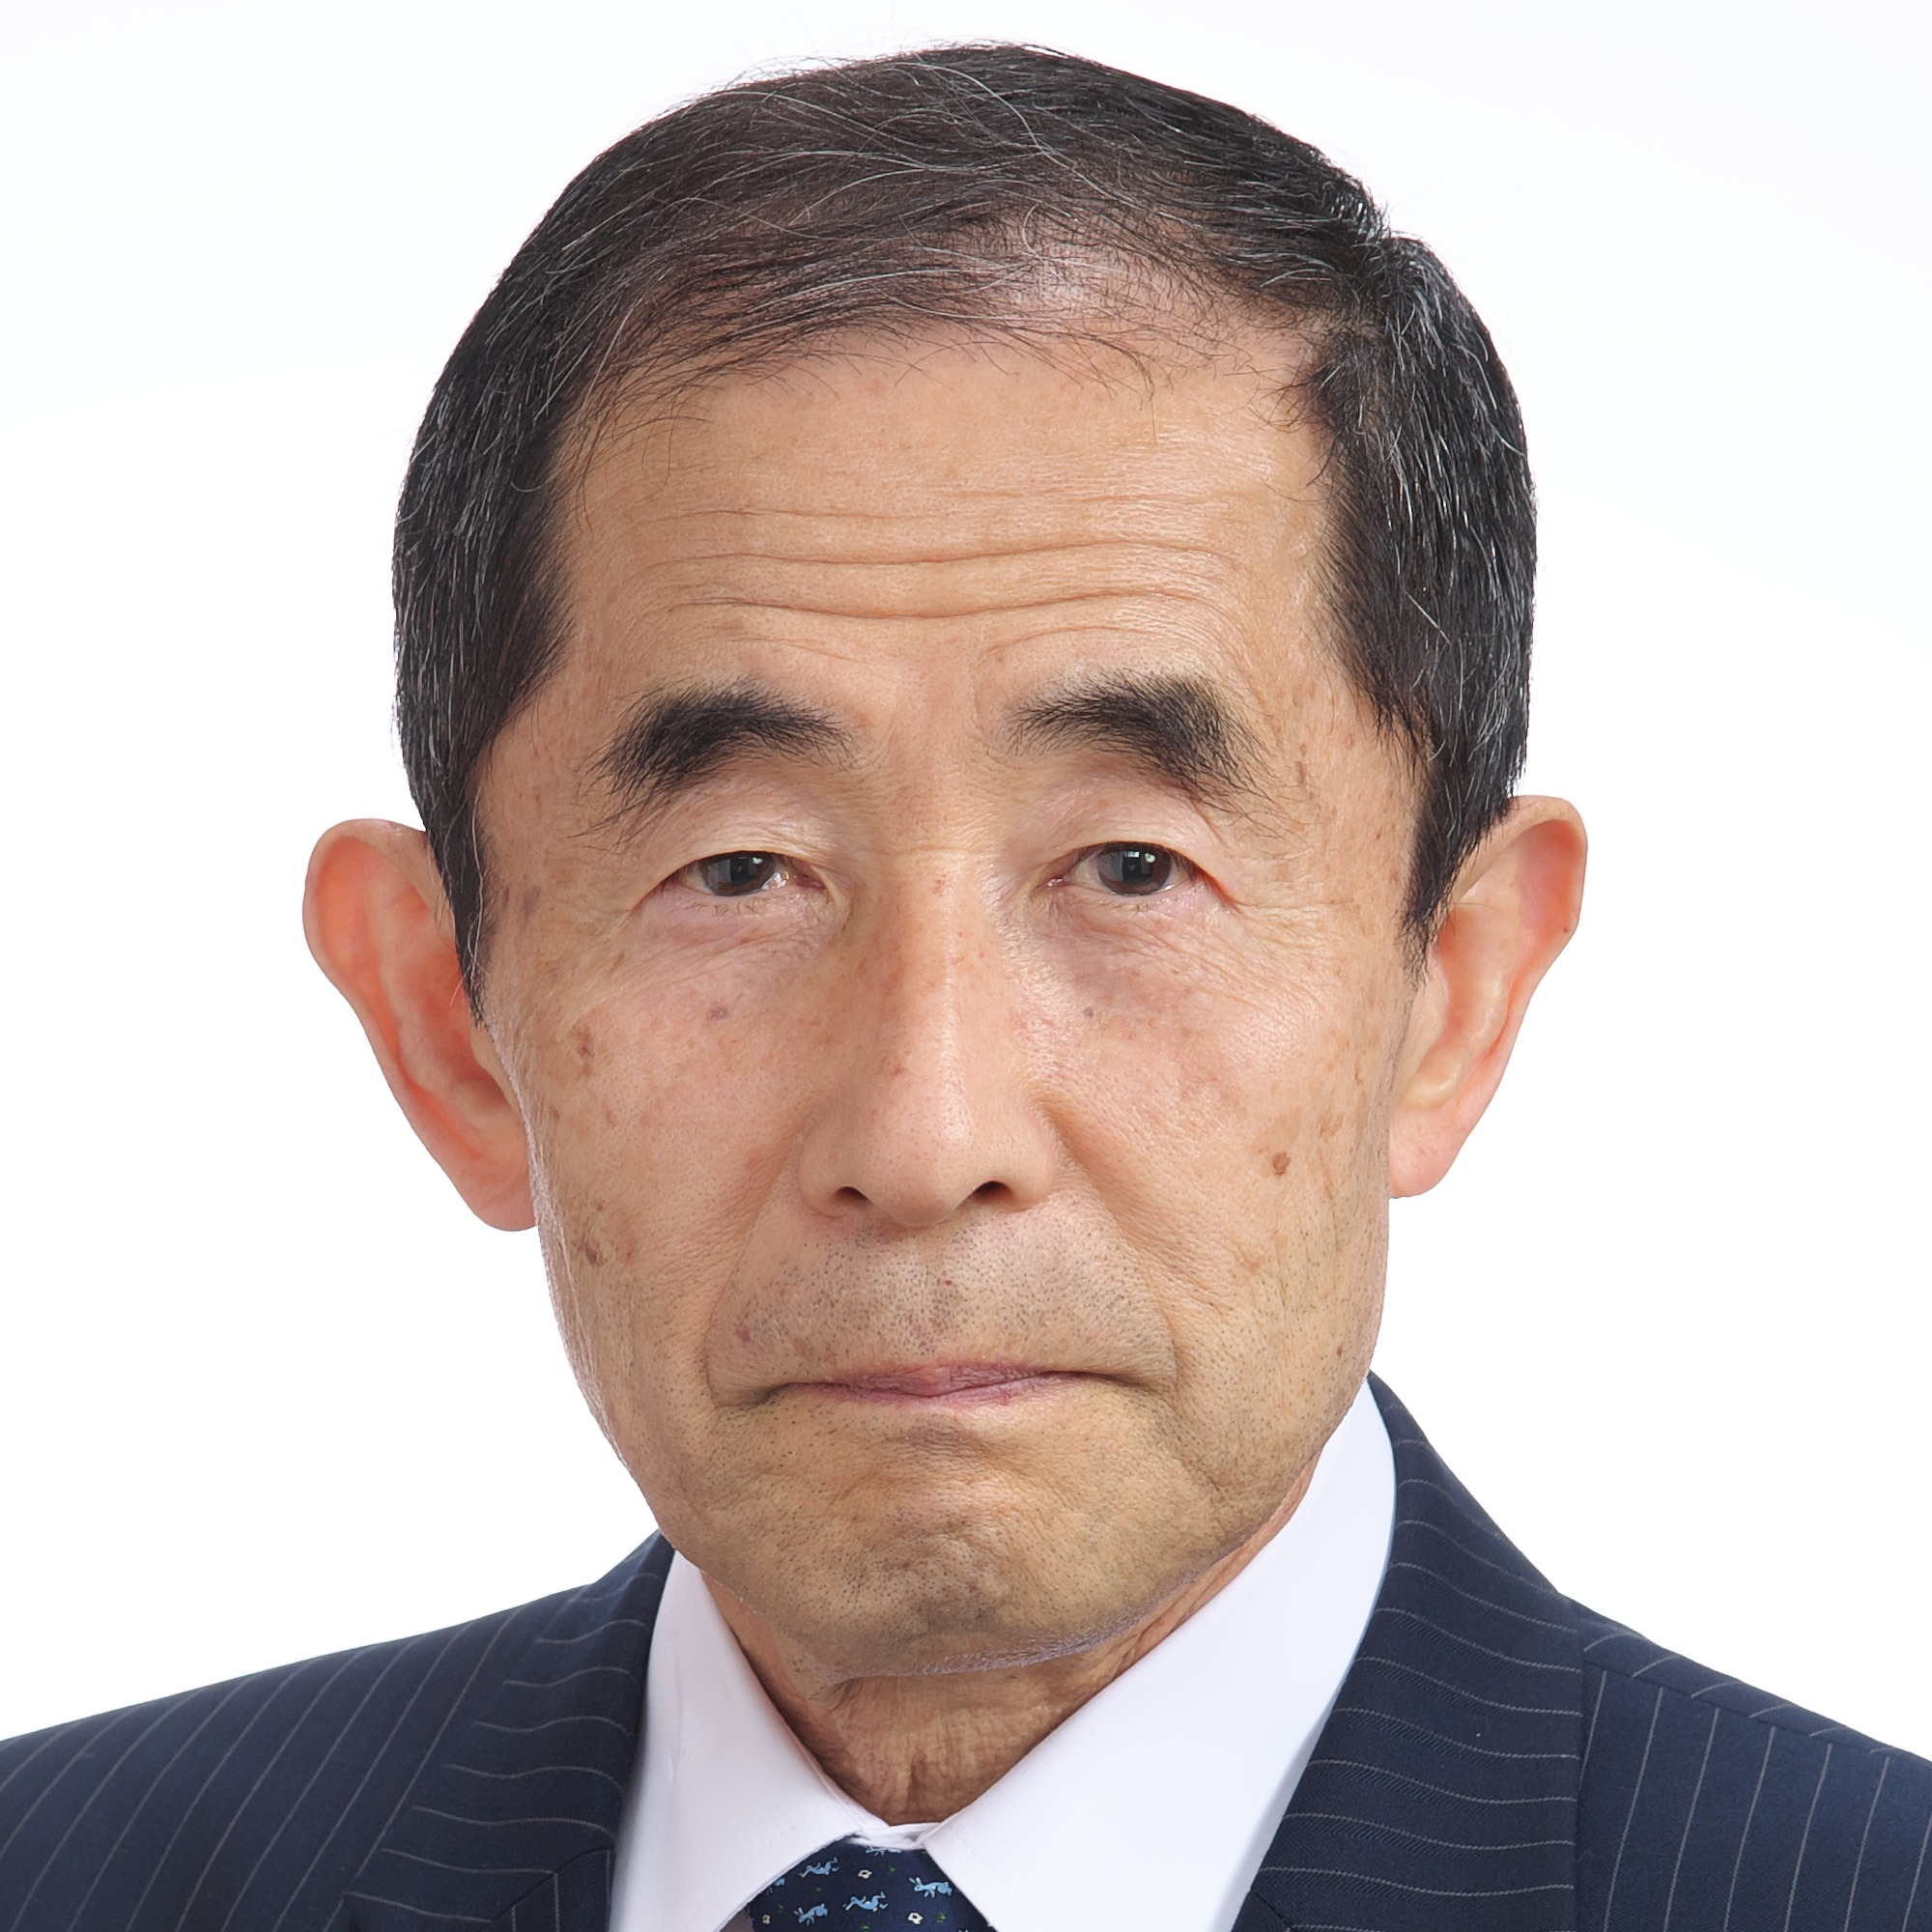 181123_Hitonobu_TomoikeB (2) (1)